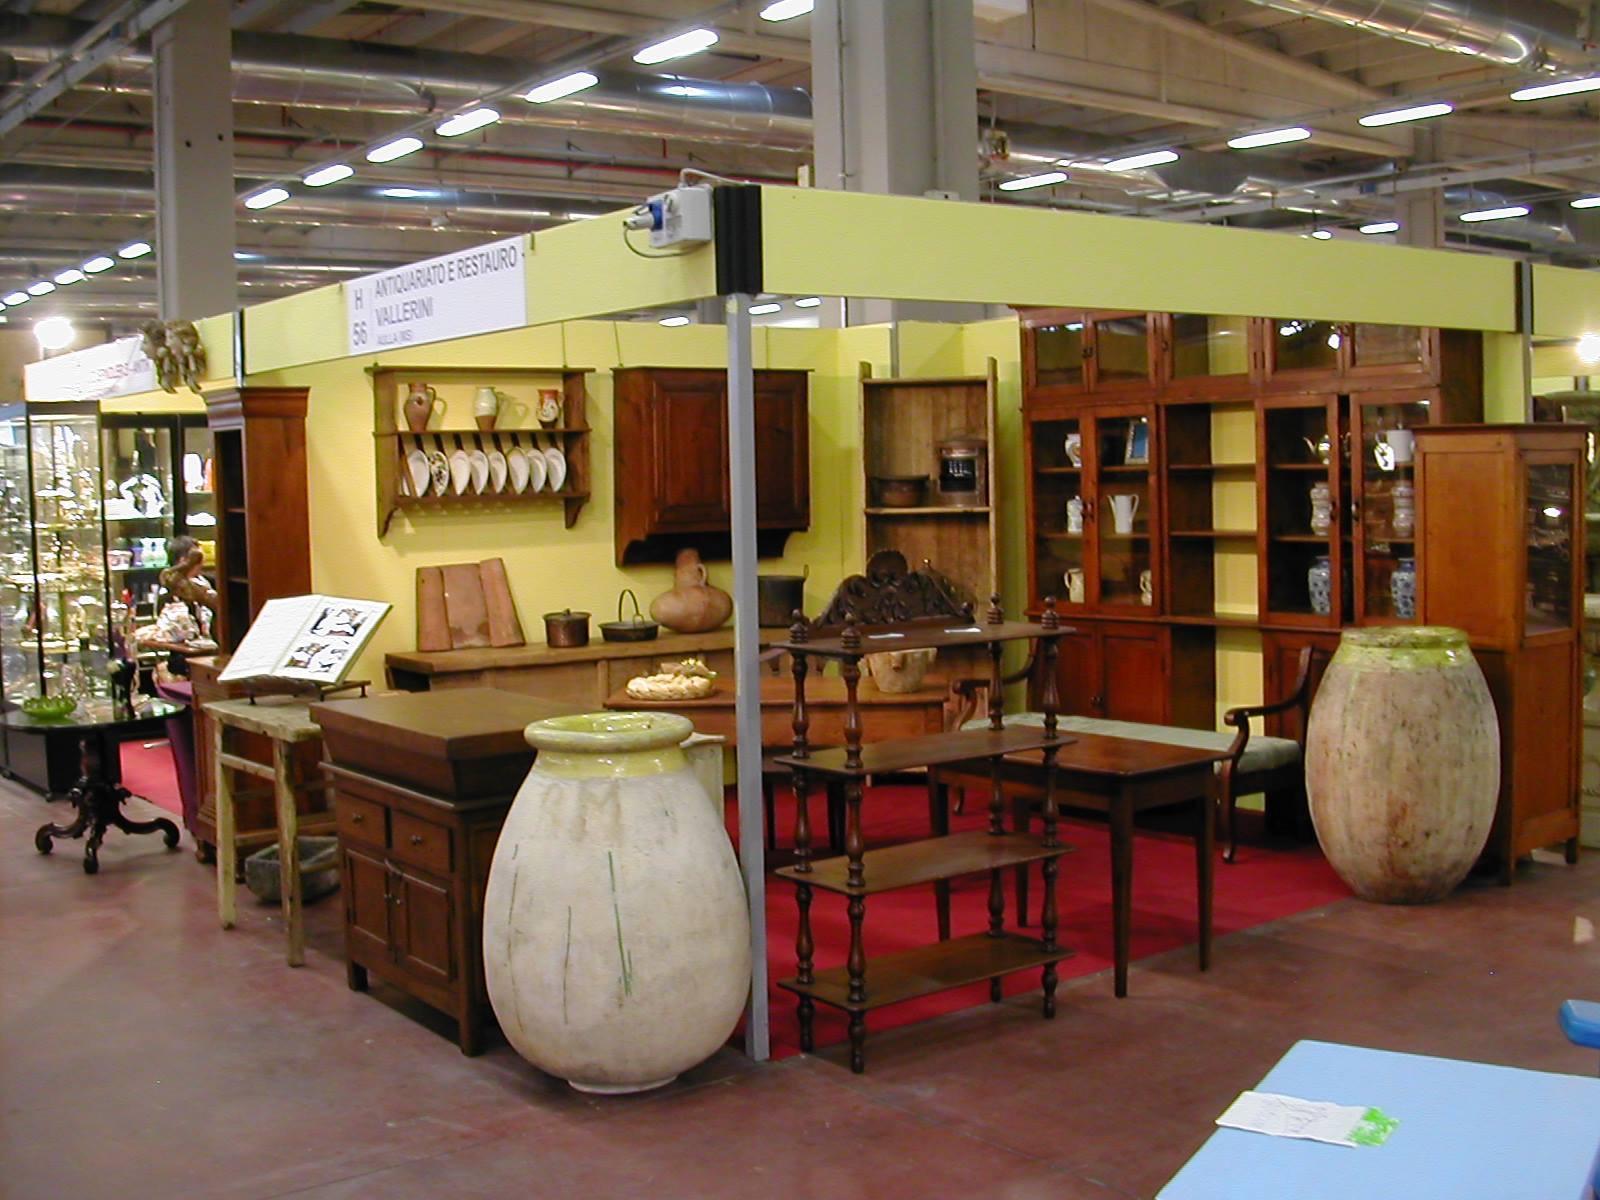 Vallerini antiquariato laboratorio ed esposizione for Valutazione antiquariato